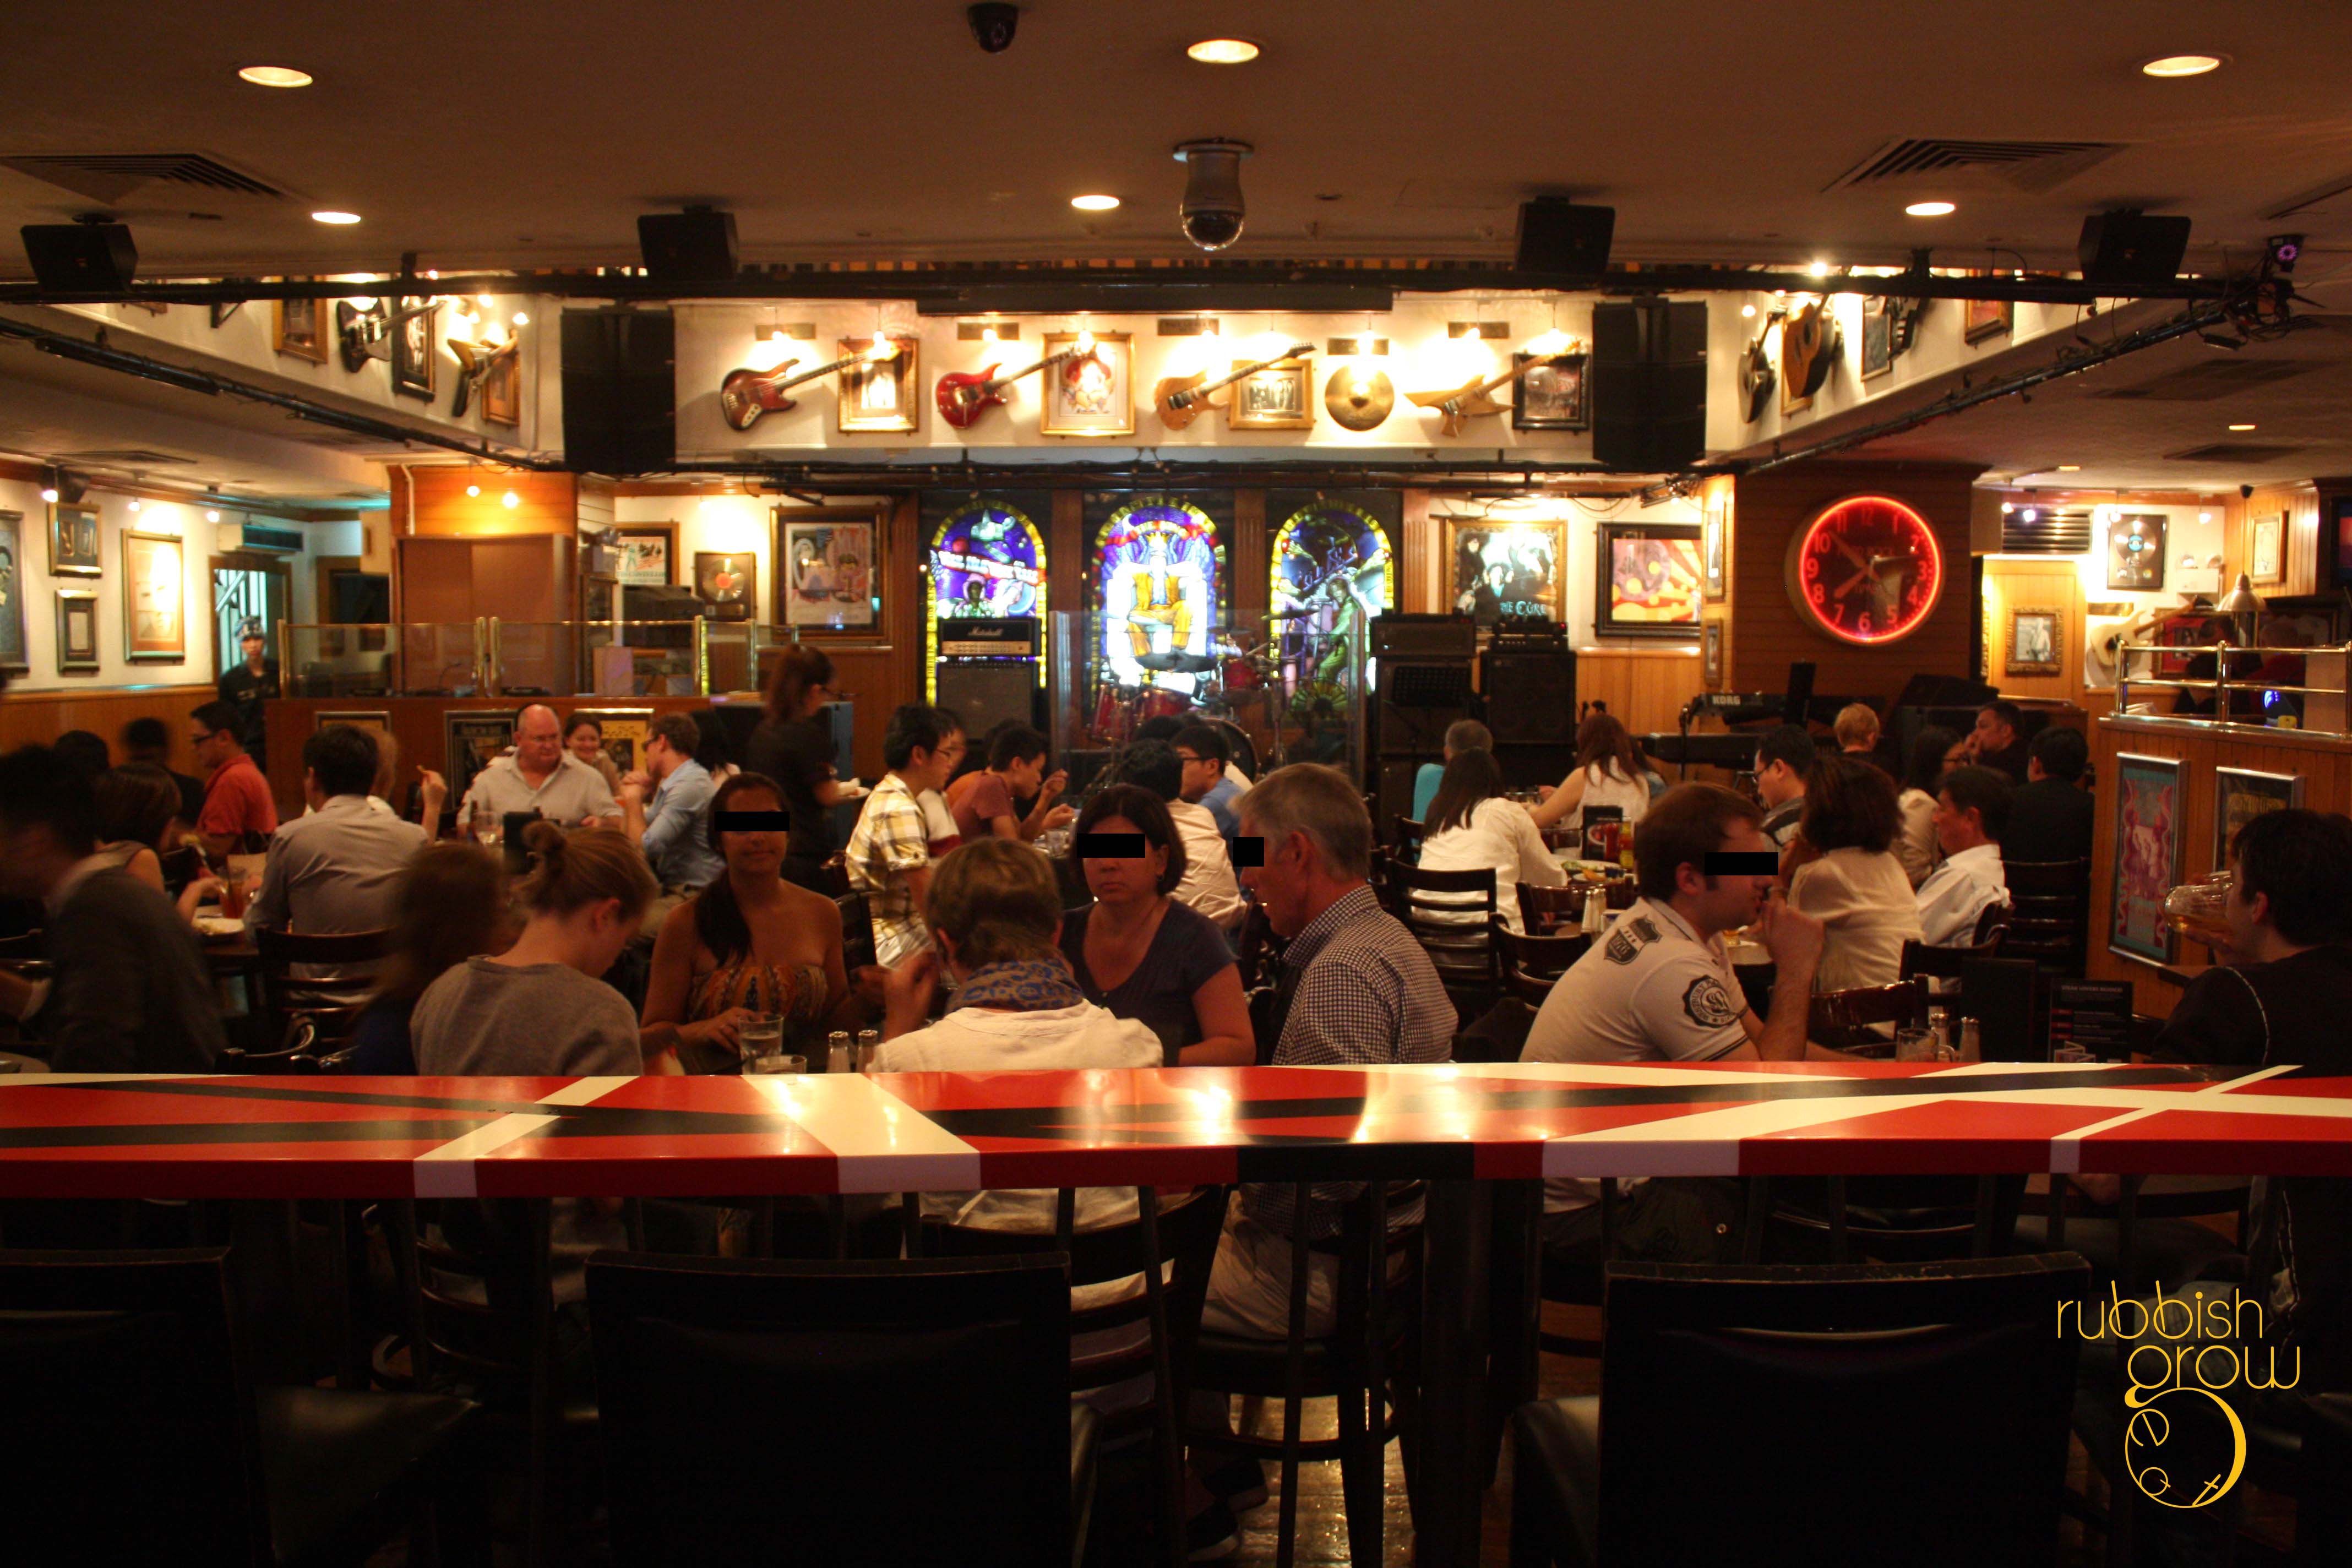 Hard Rock Cafe Orchard Singapore Rubbish Eat Rubbish Grow